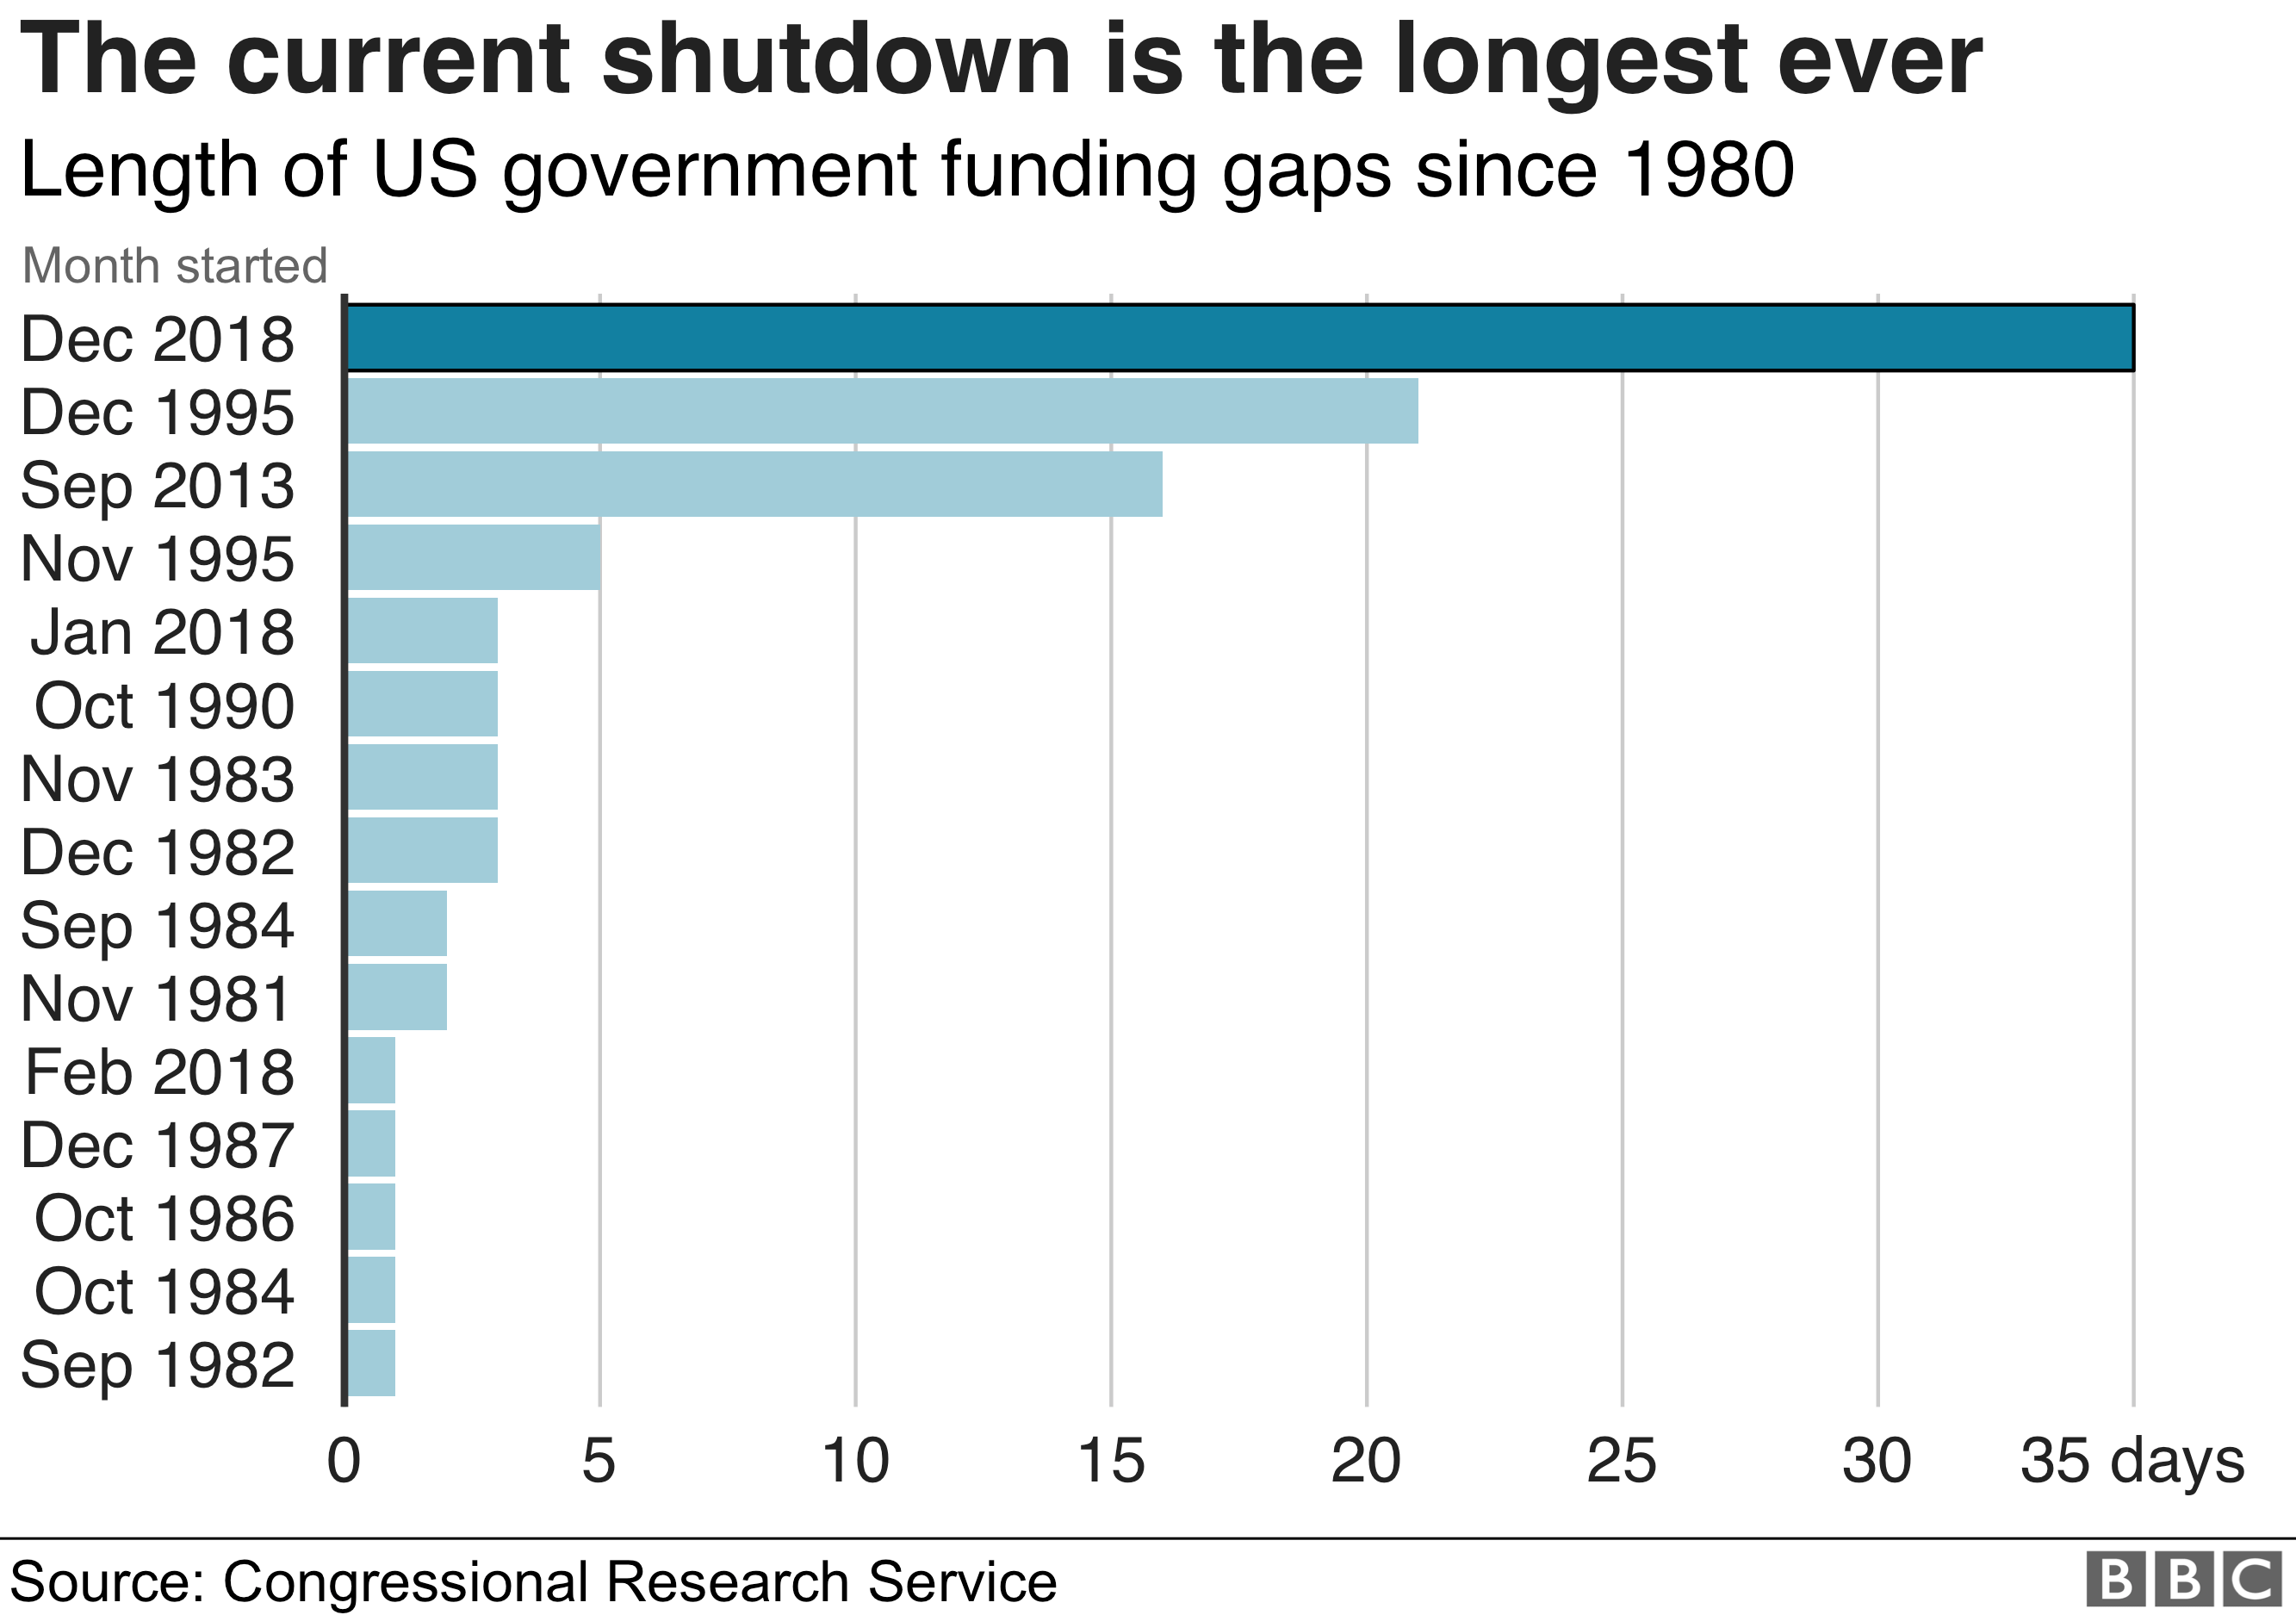 Graphic showing shutdown length